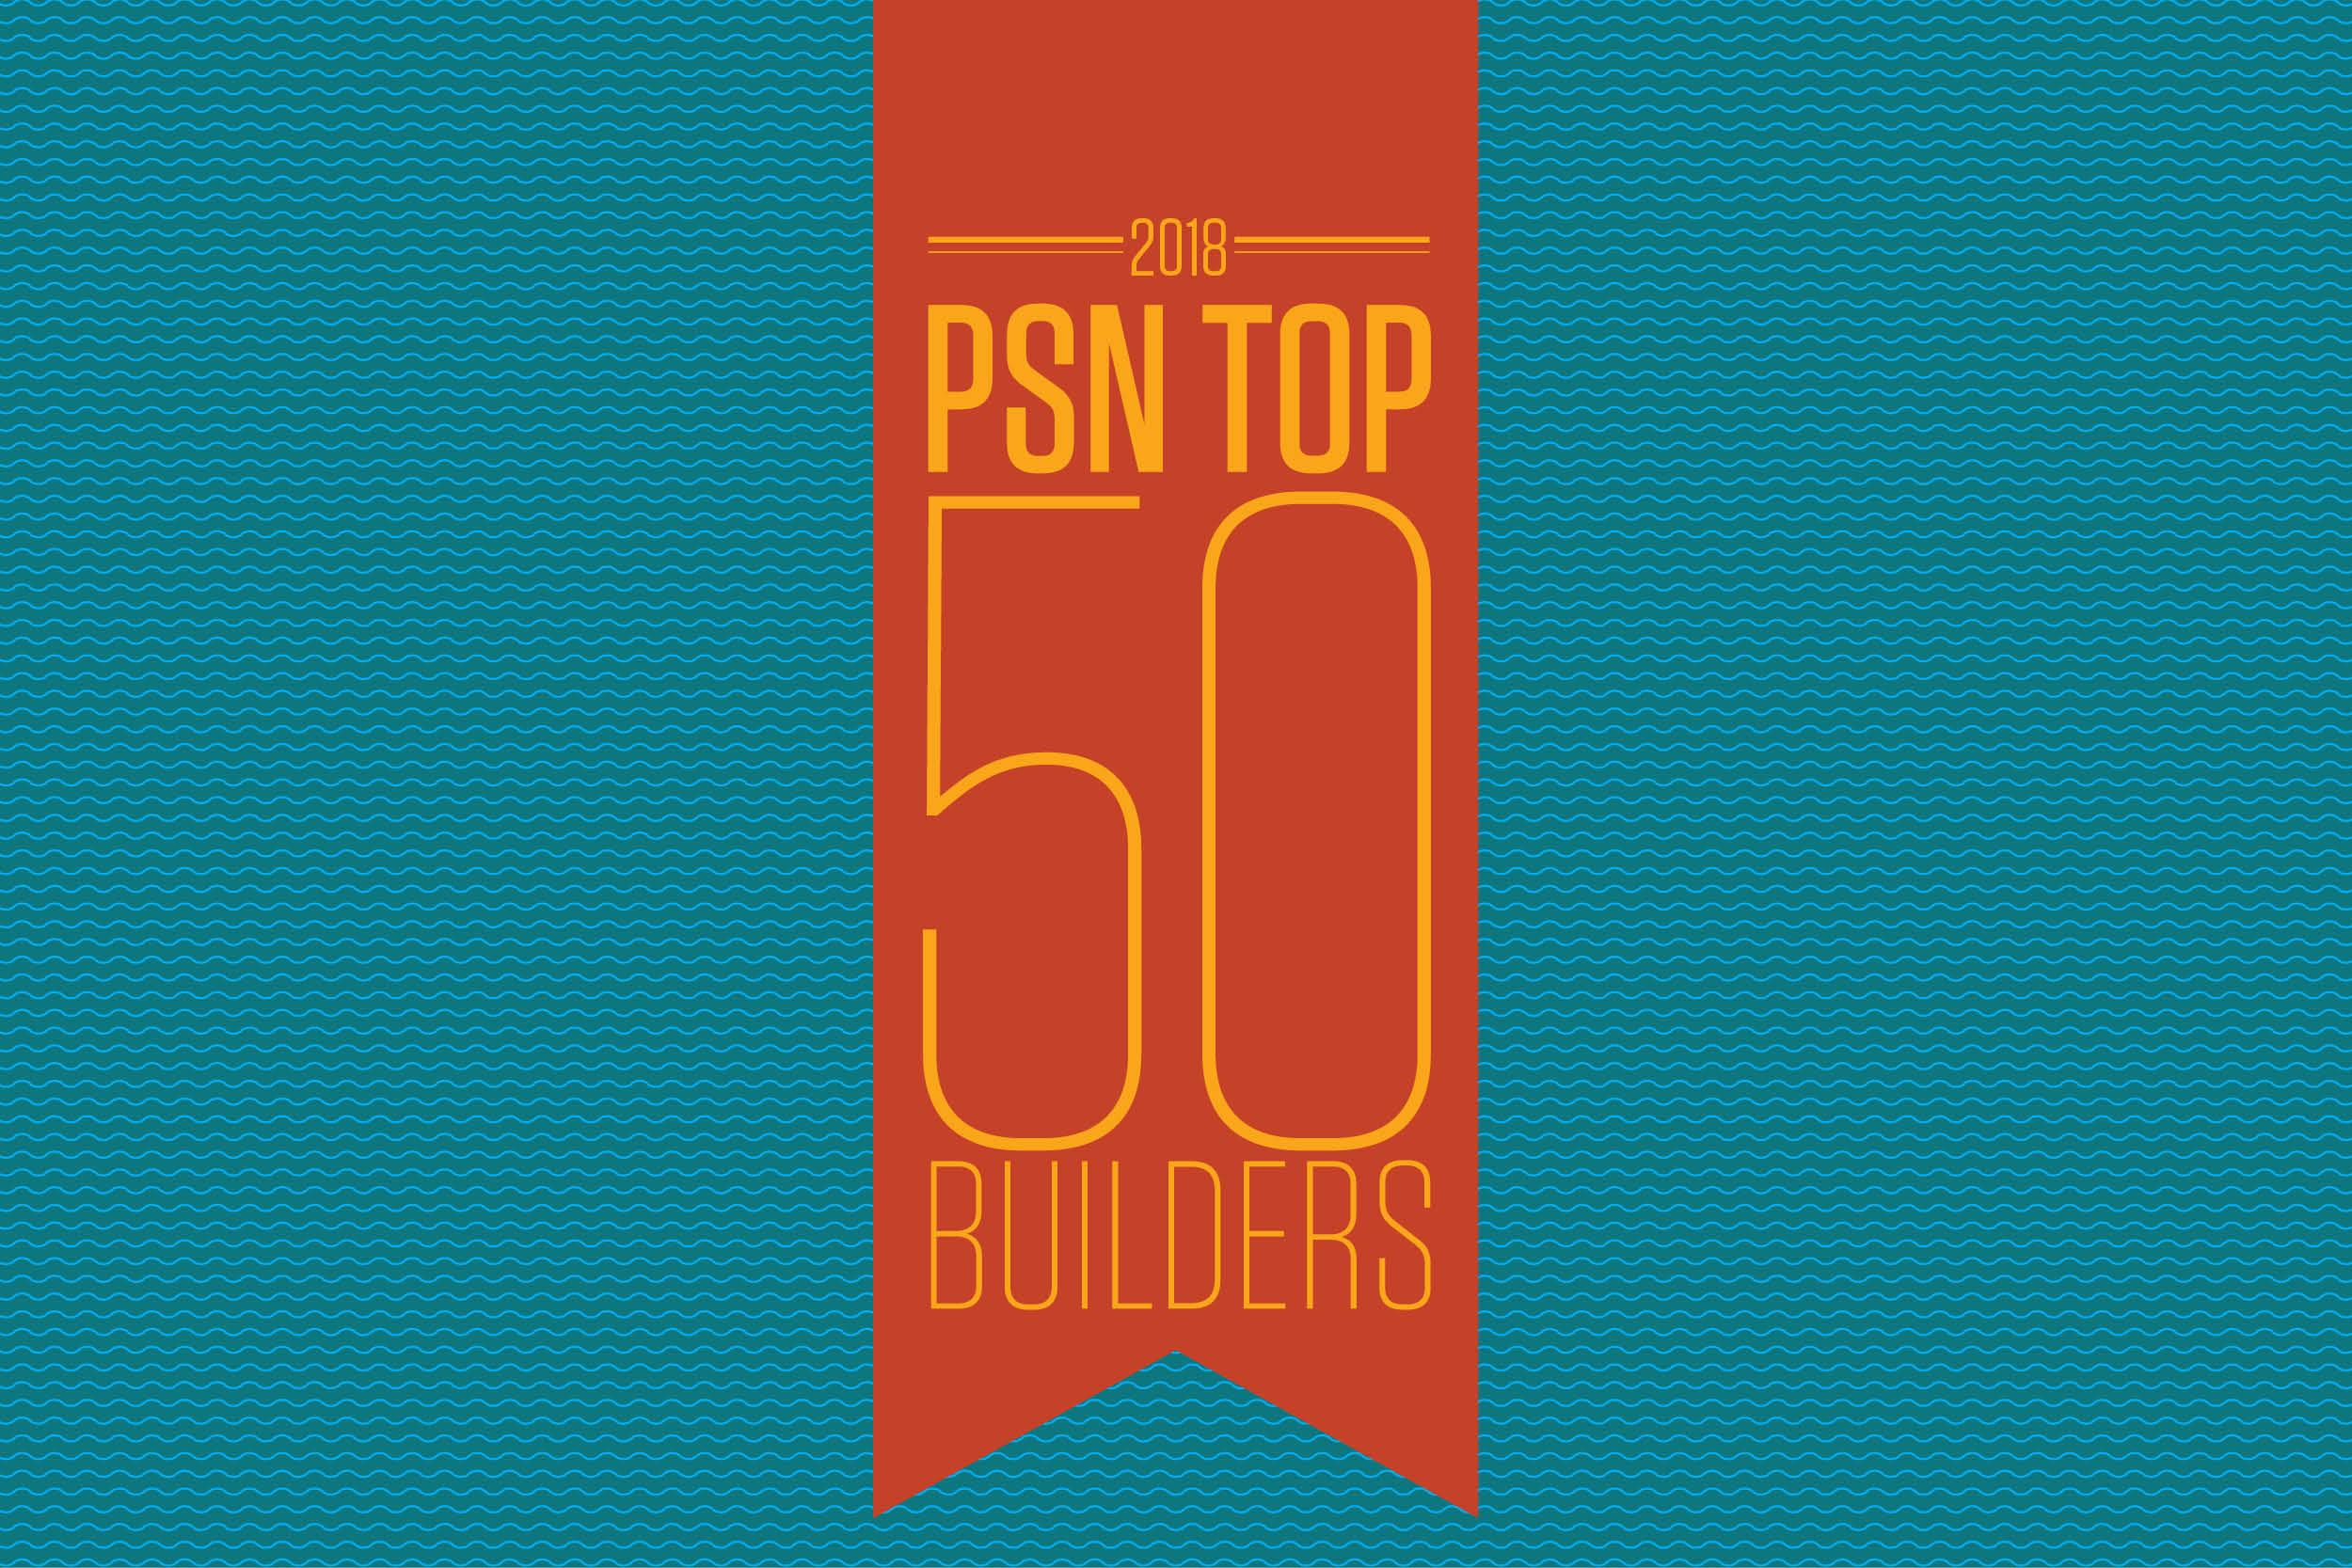 psn ranking.jpg